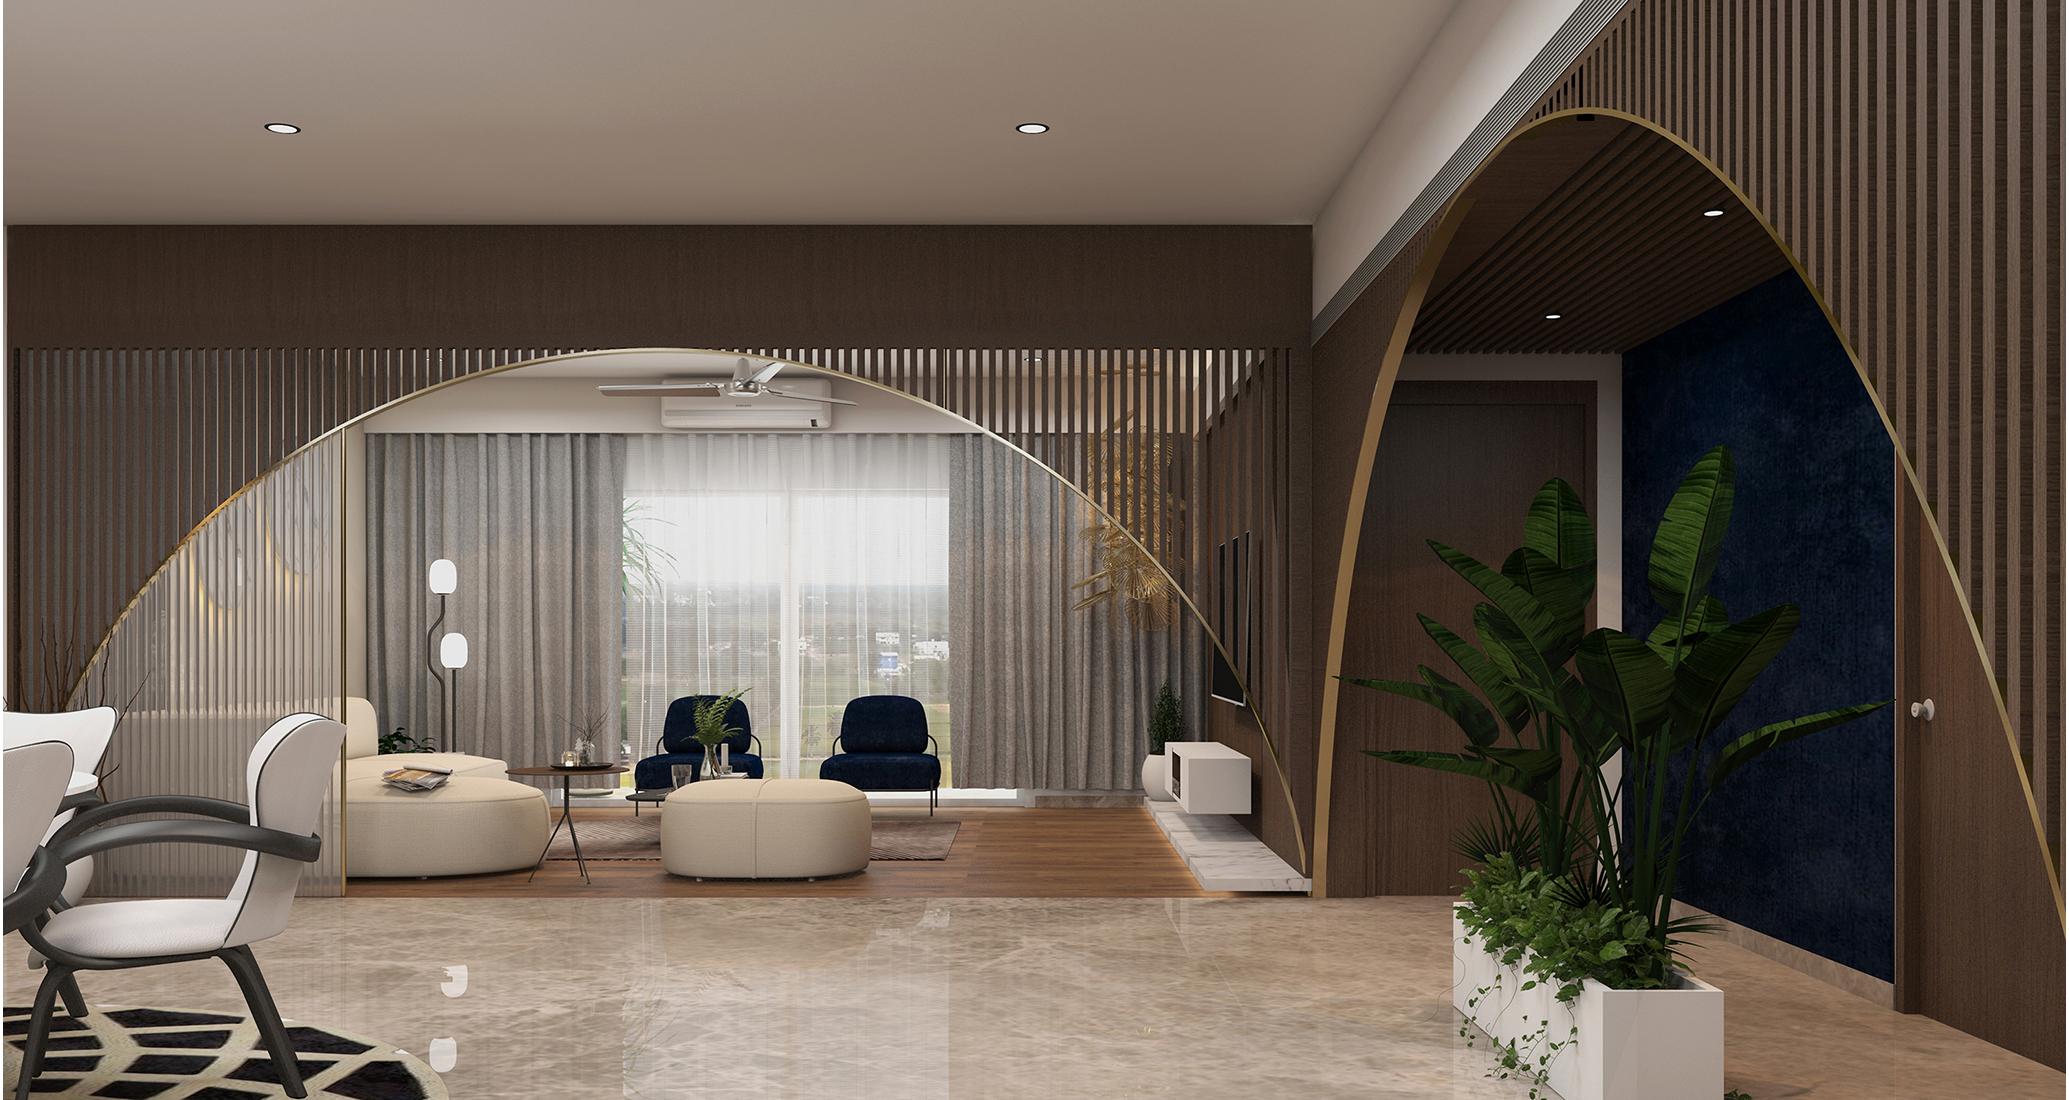 warp architects_svb's interiors (1).jpg